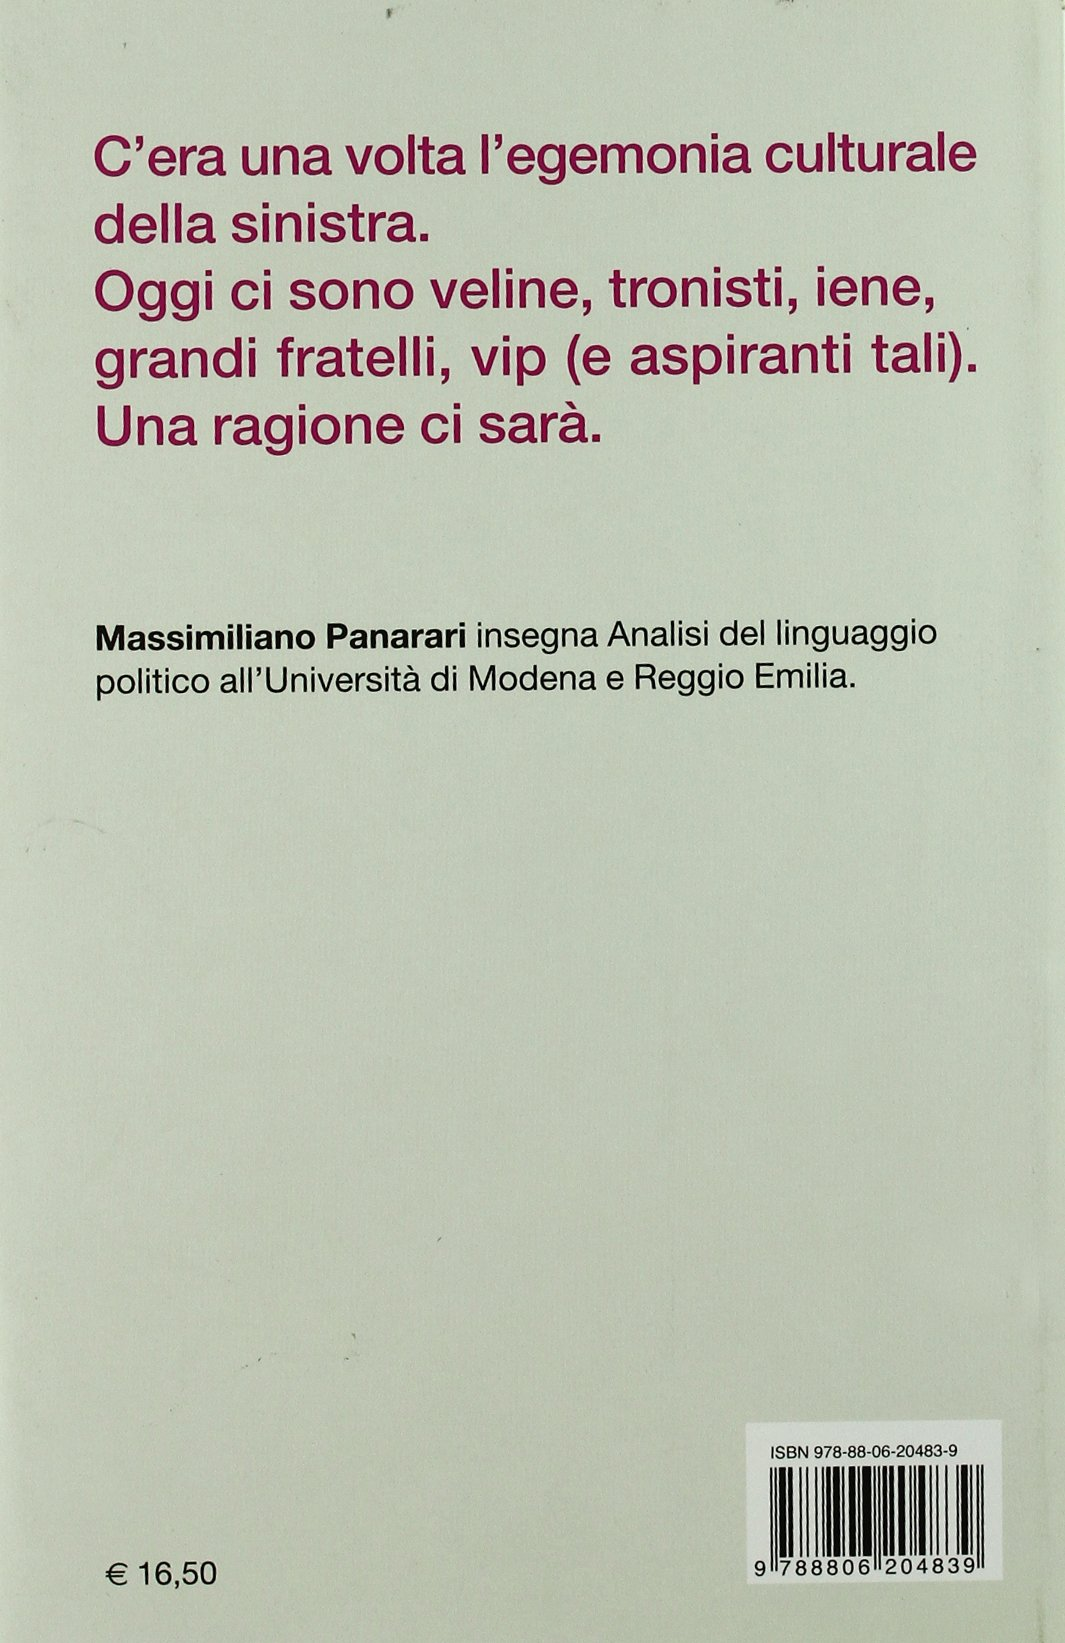 Da itL'egemonia Gramsci Gossip Amazon Al SottoculturaleL'italia pUzVSqM